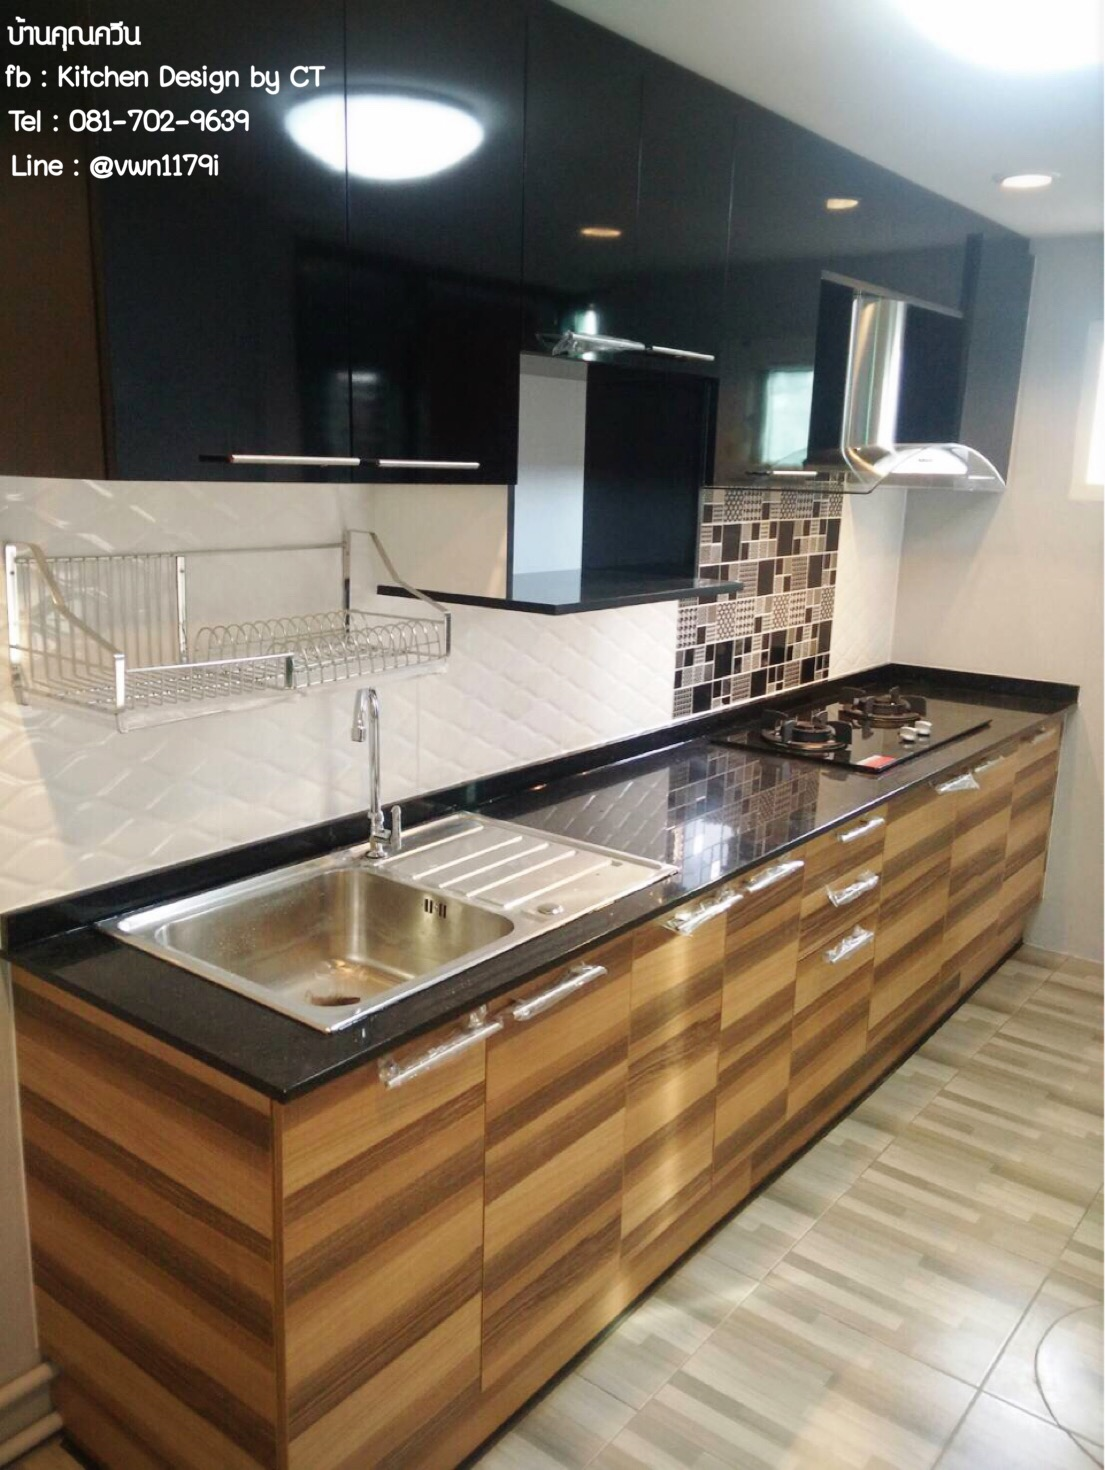 Wooden Modern Kitchen (ครัวบิ้วอินลายไม้สไตล์โมเดิร์น)